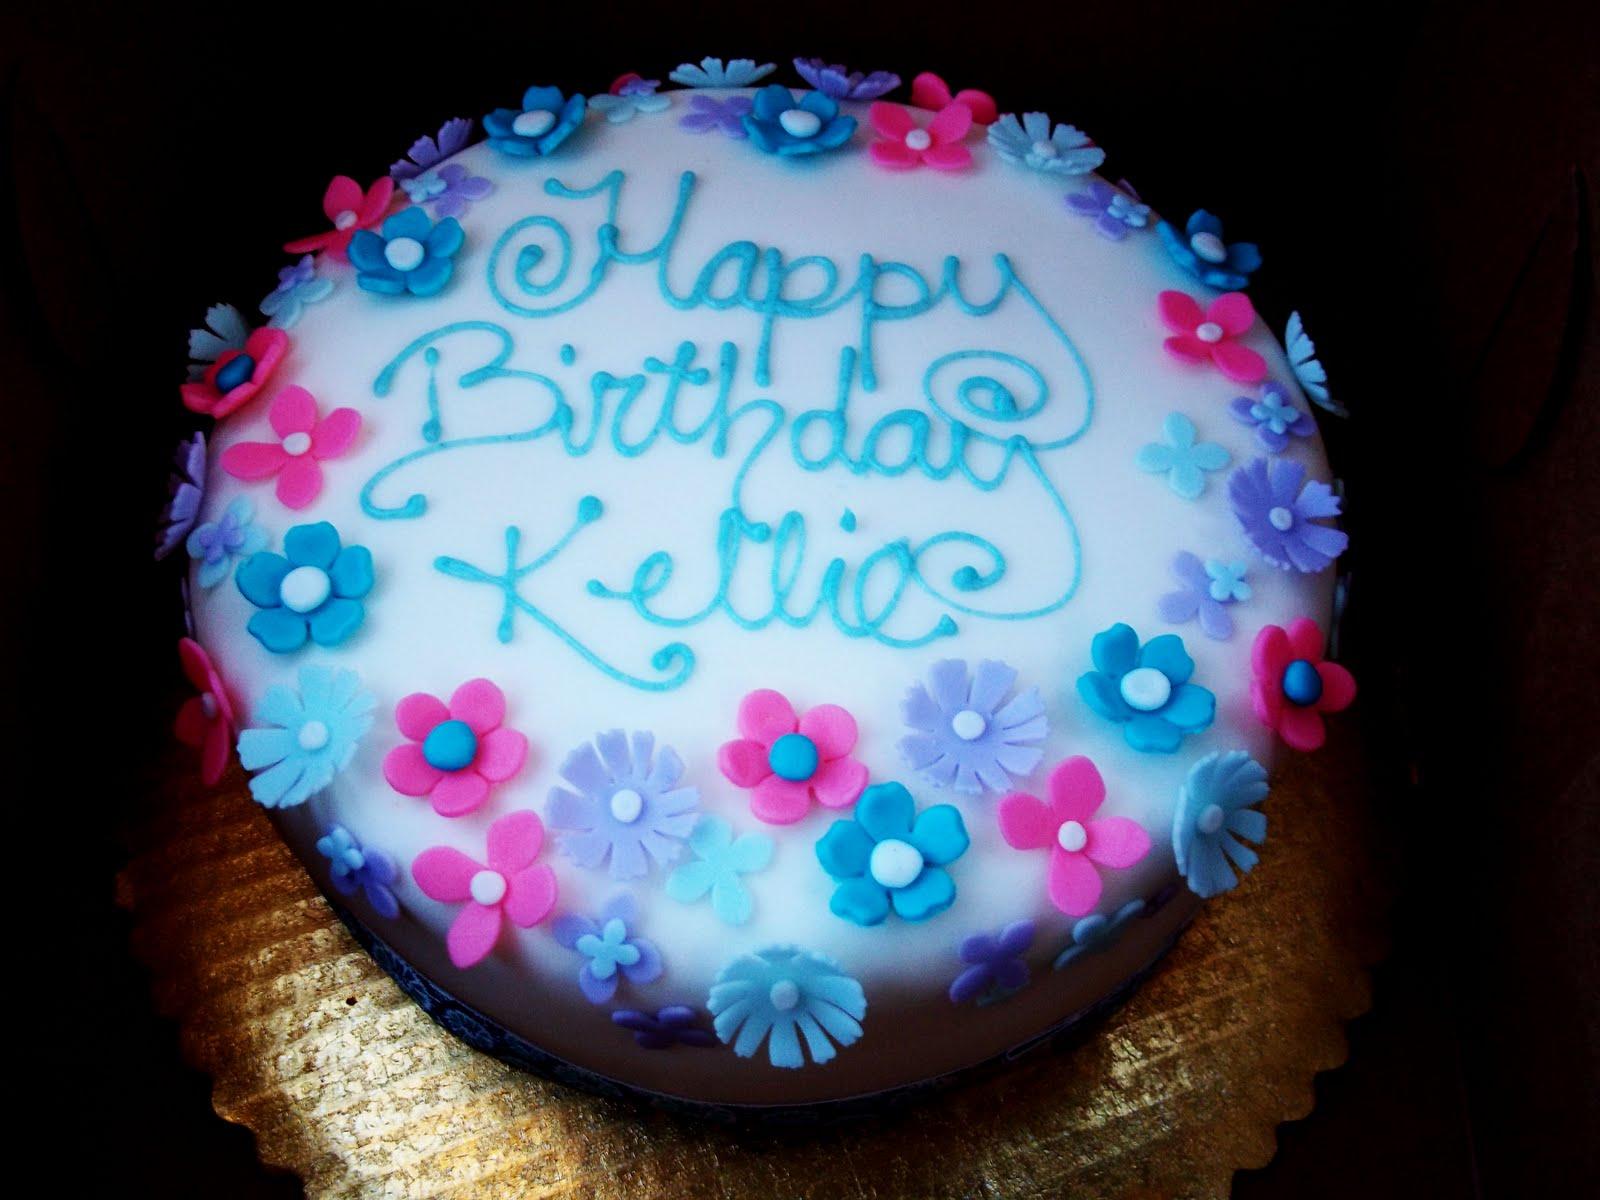 bite size me: Kellie's birthday cake!